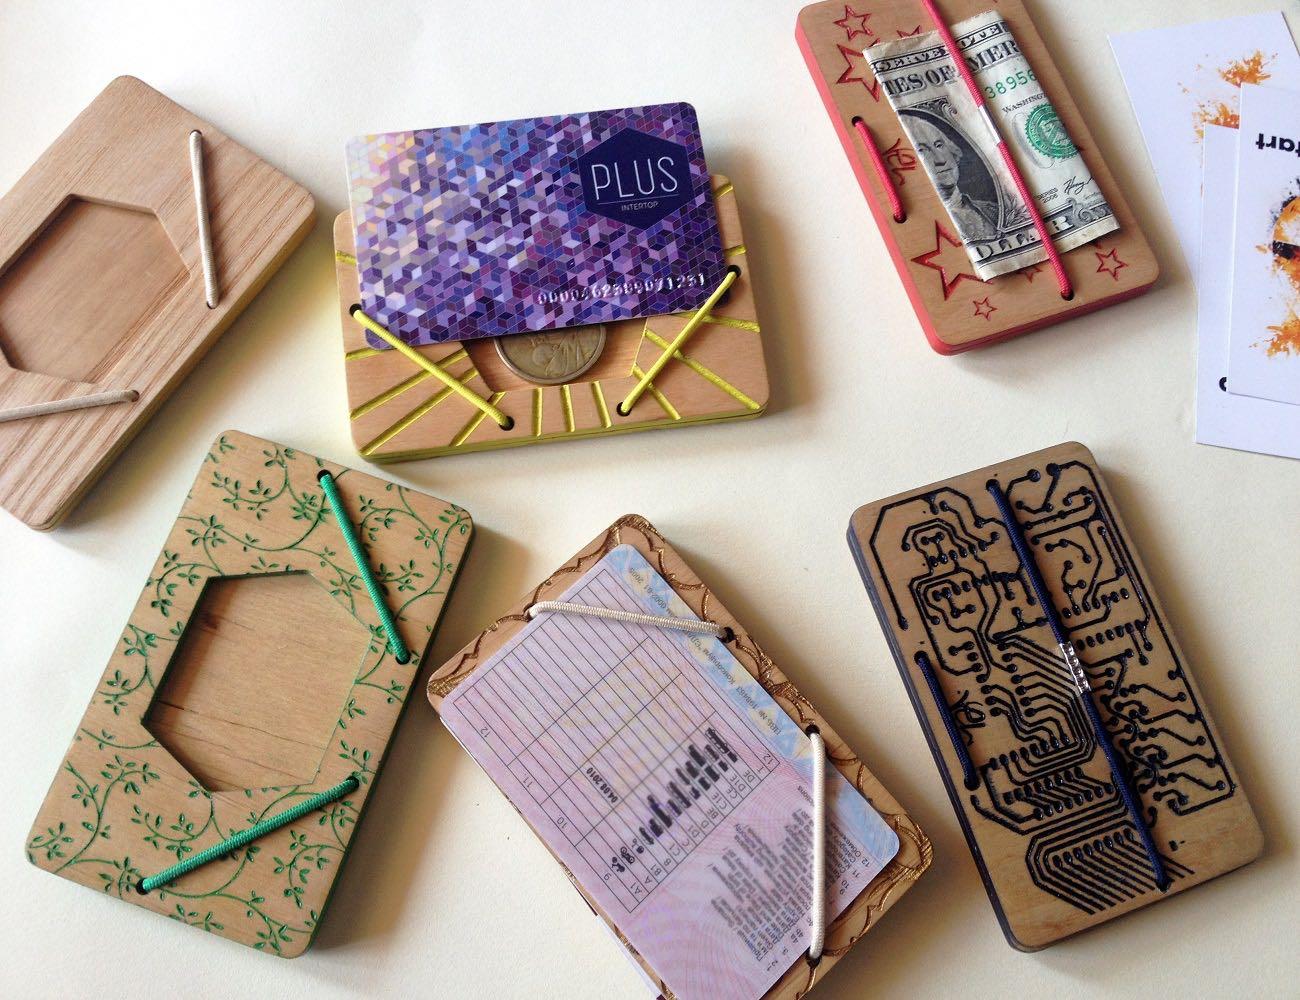 vel-stylish-wooden-cardholder-04